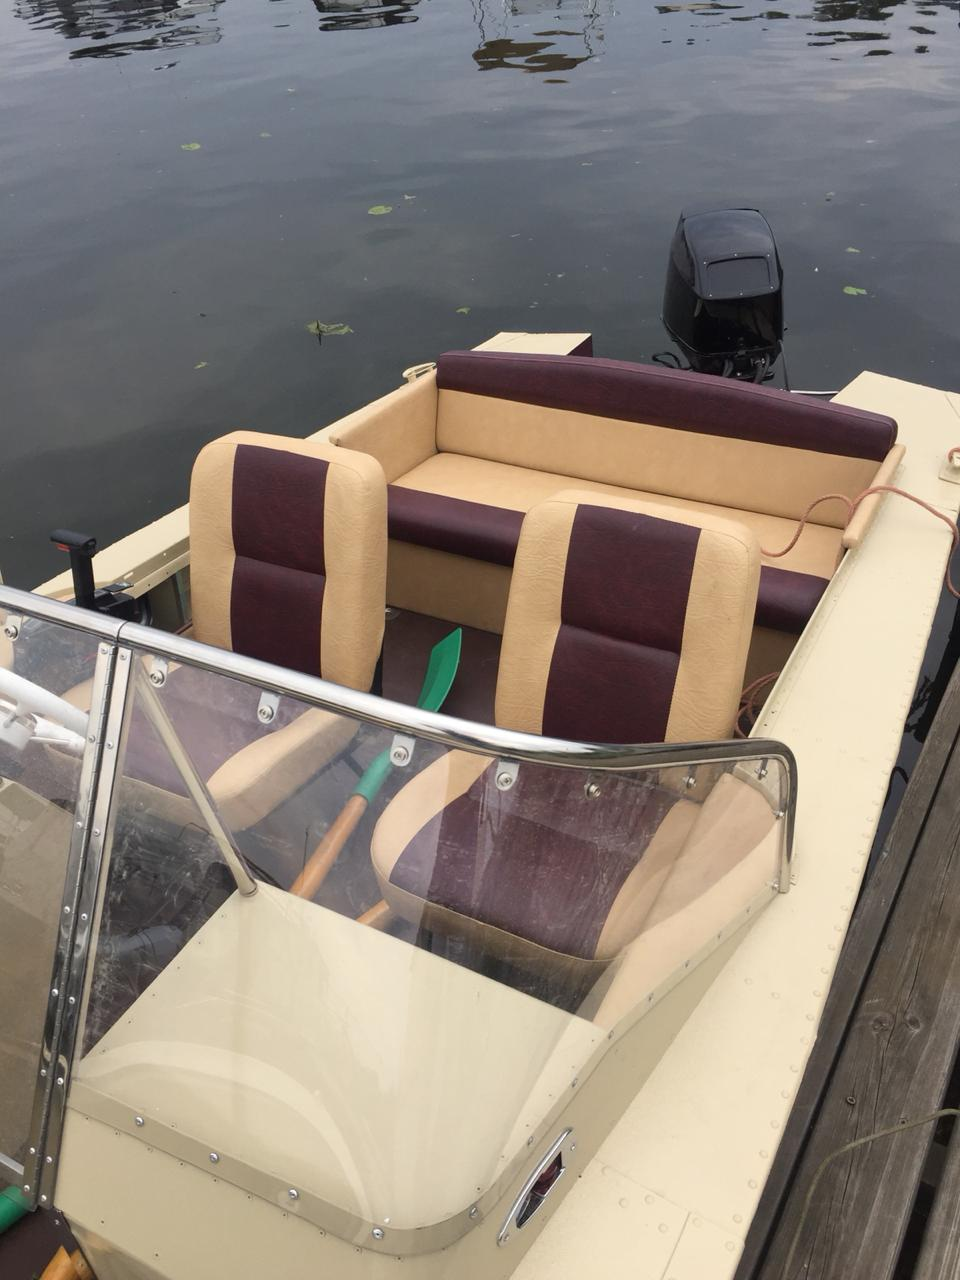 Тюнинг катера «Прогресс 2м» цена в компании «МаринЛайн». Ссылка на фотографию: http://marinline.ru/uploads/posts/2018-08/1533720904_photo-2018-08-07-15-41-37.jpg